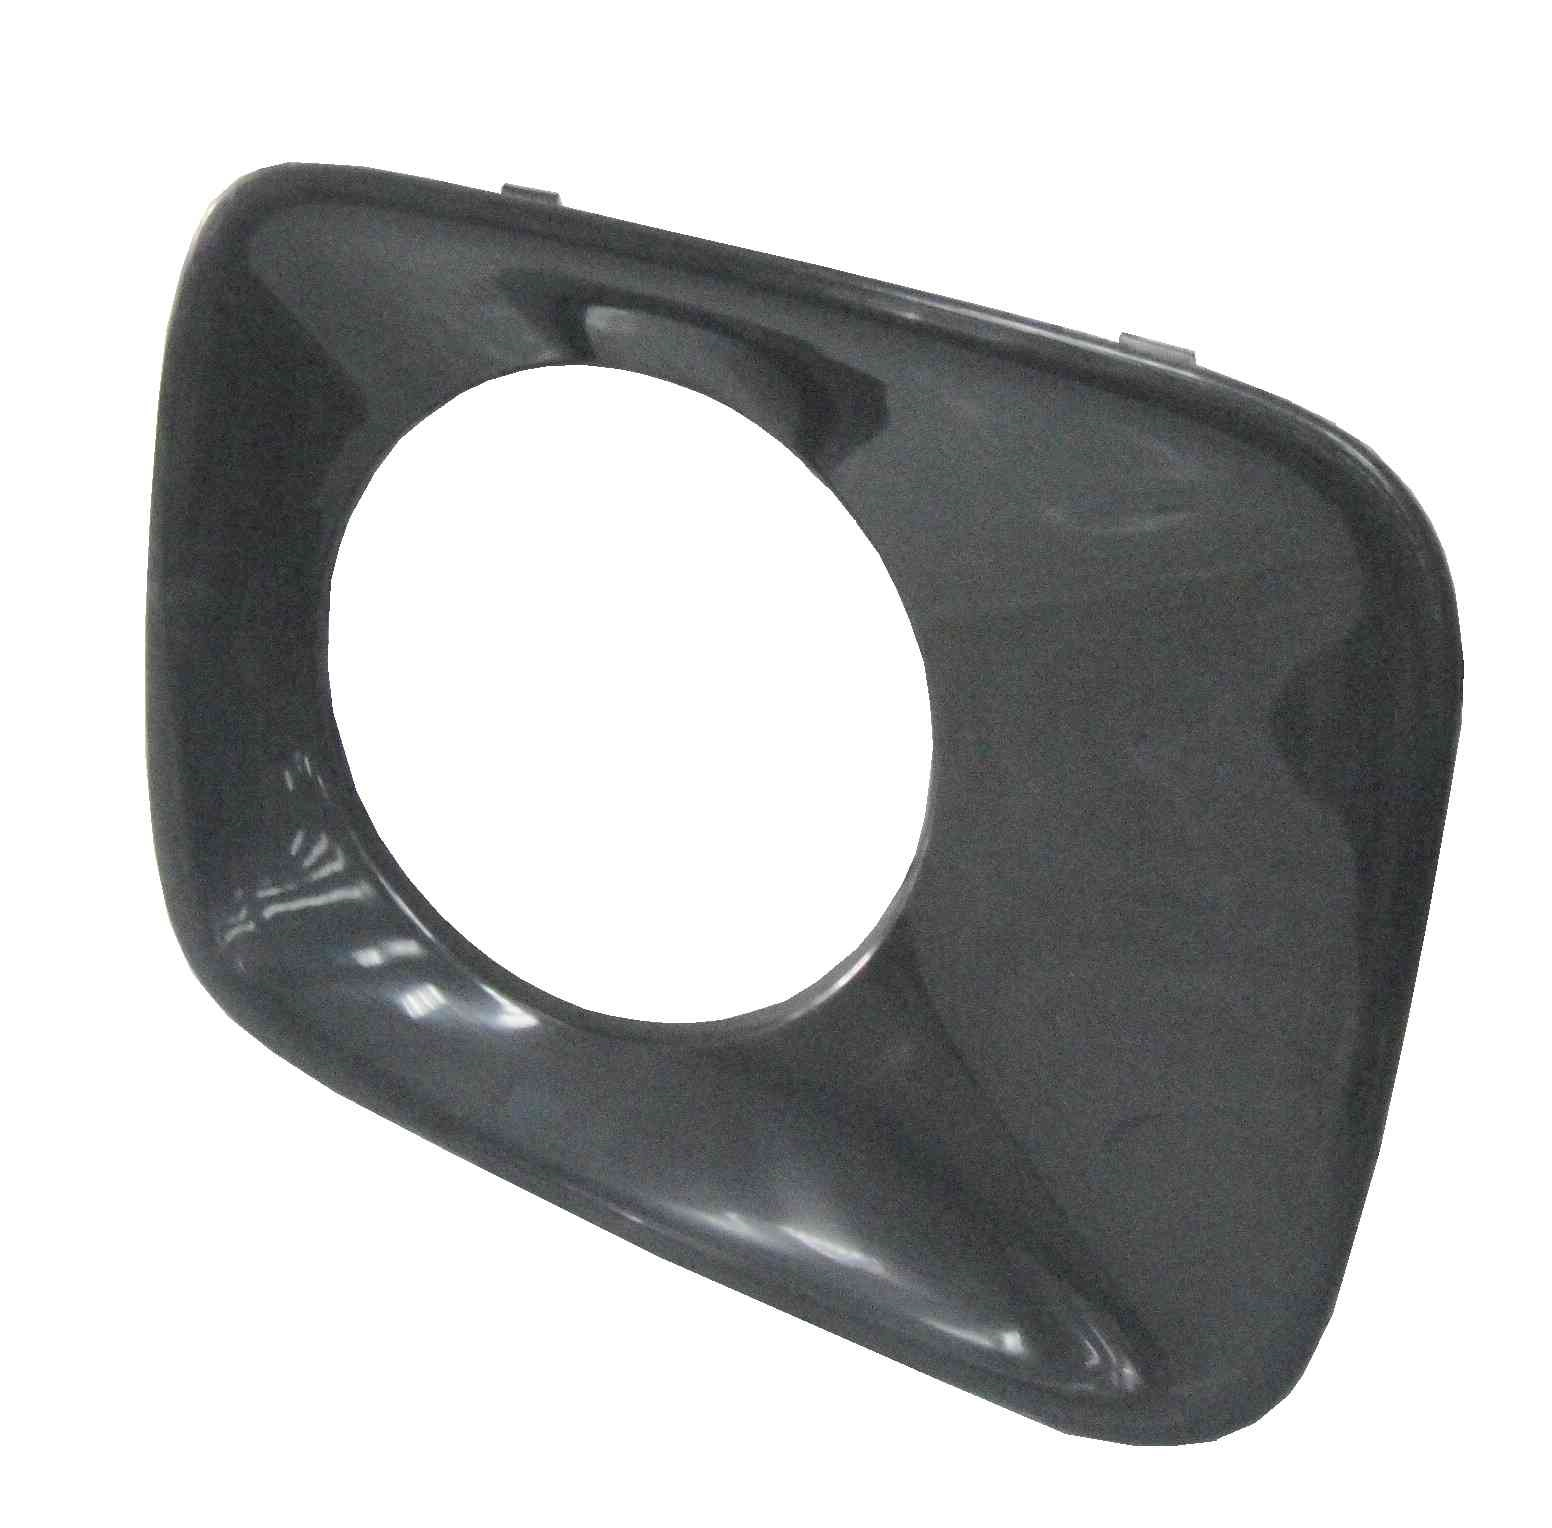 Bumper Cover For 2009-2011 Honda Pilot Touring Front Primed With Fog Light Holes